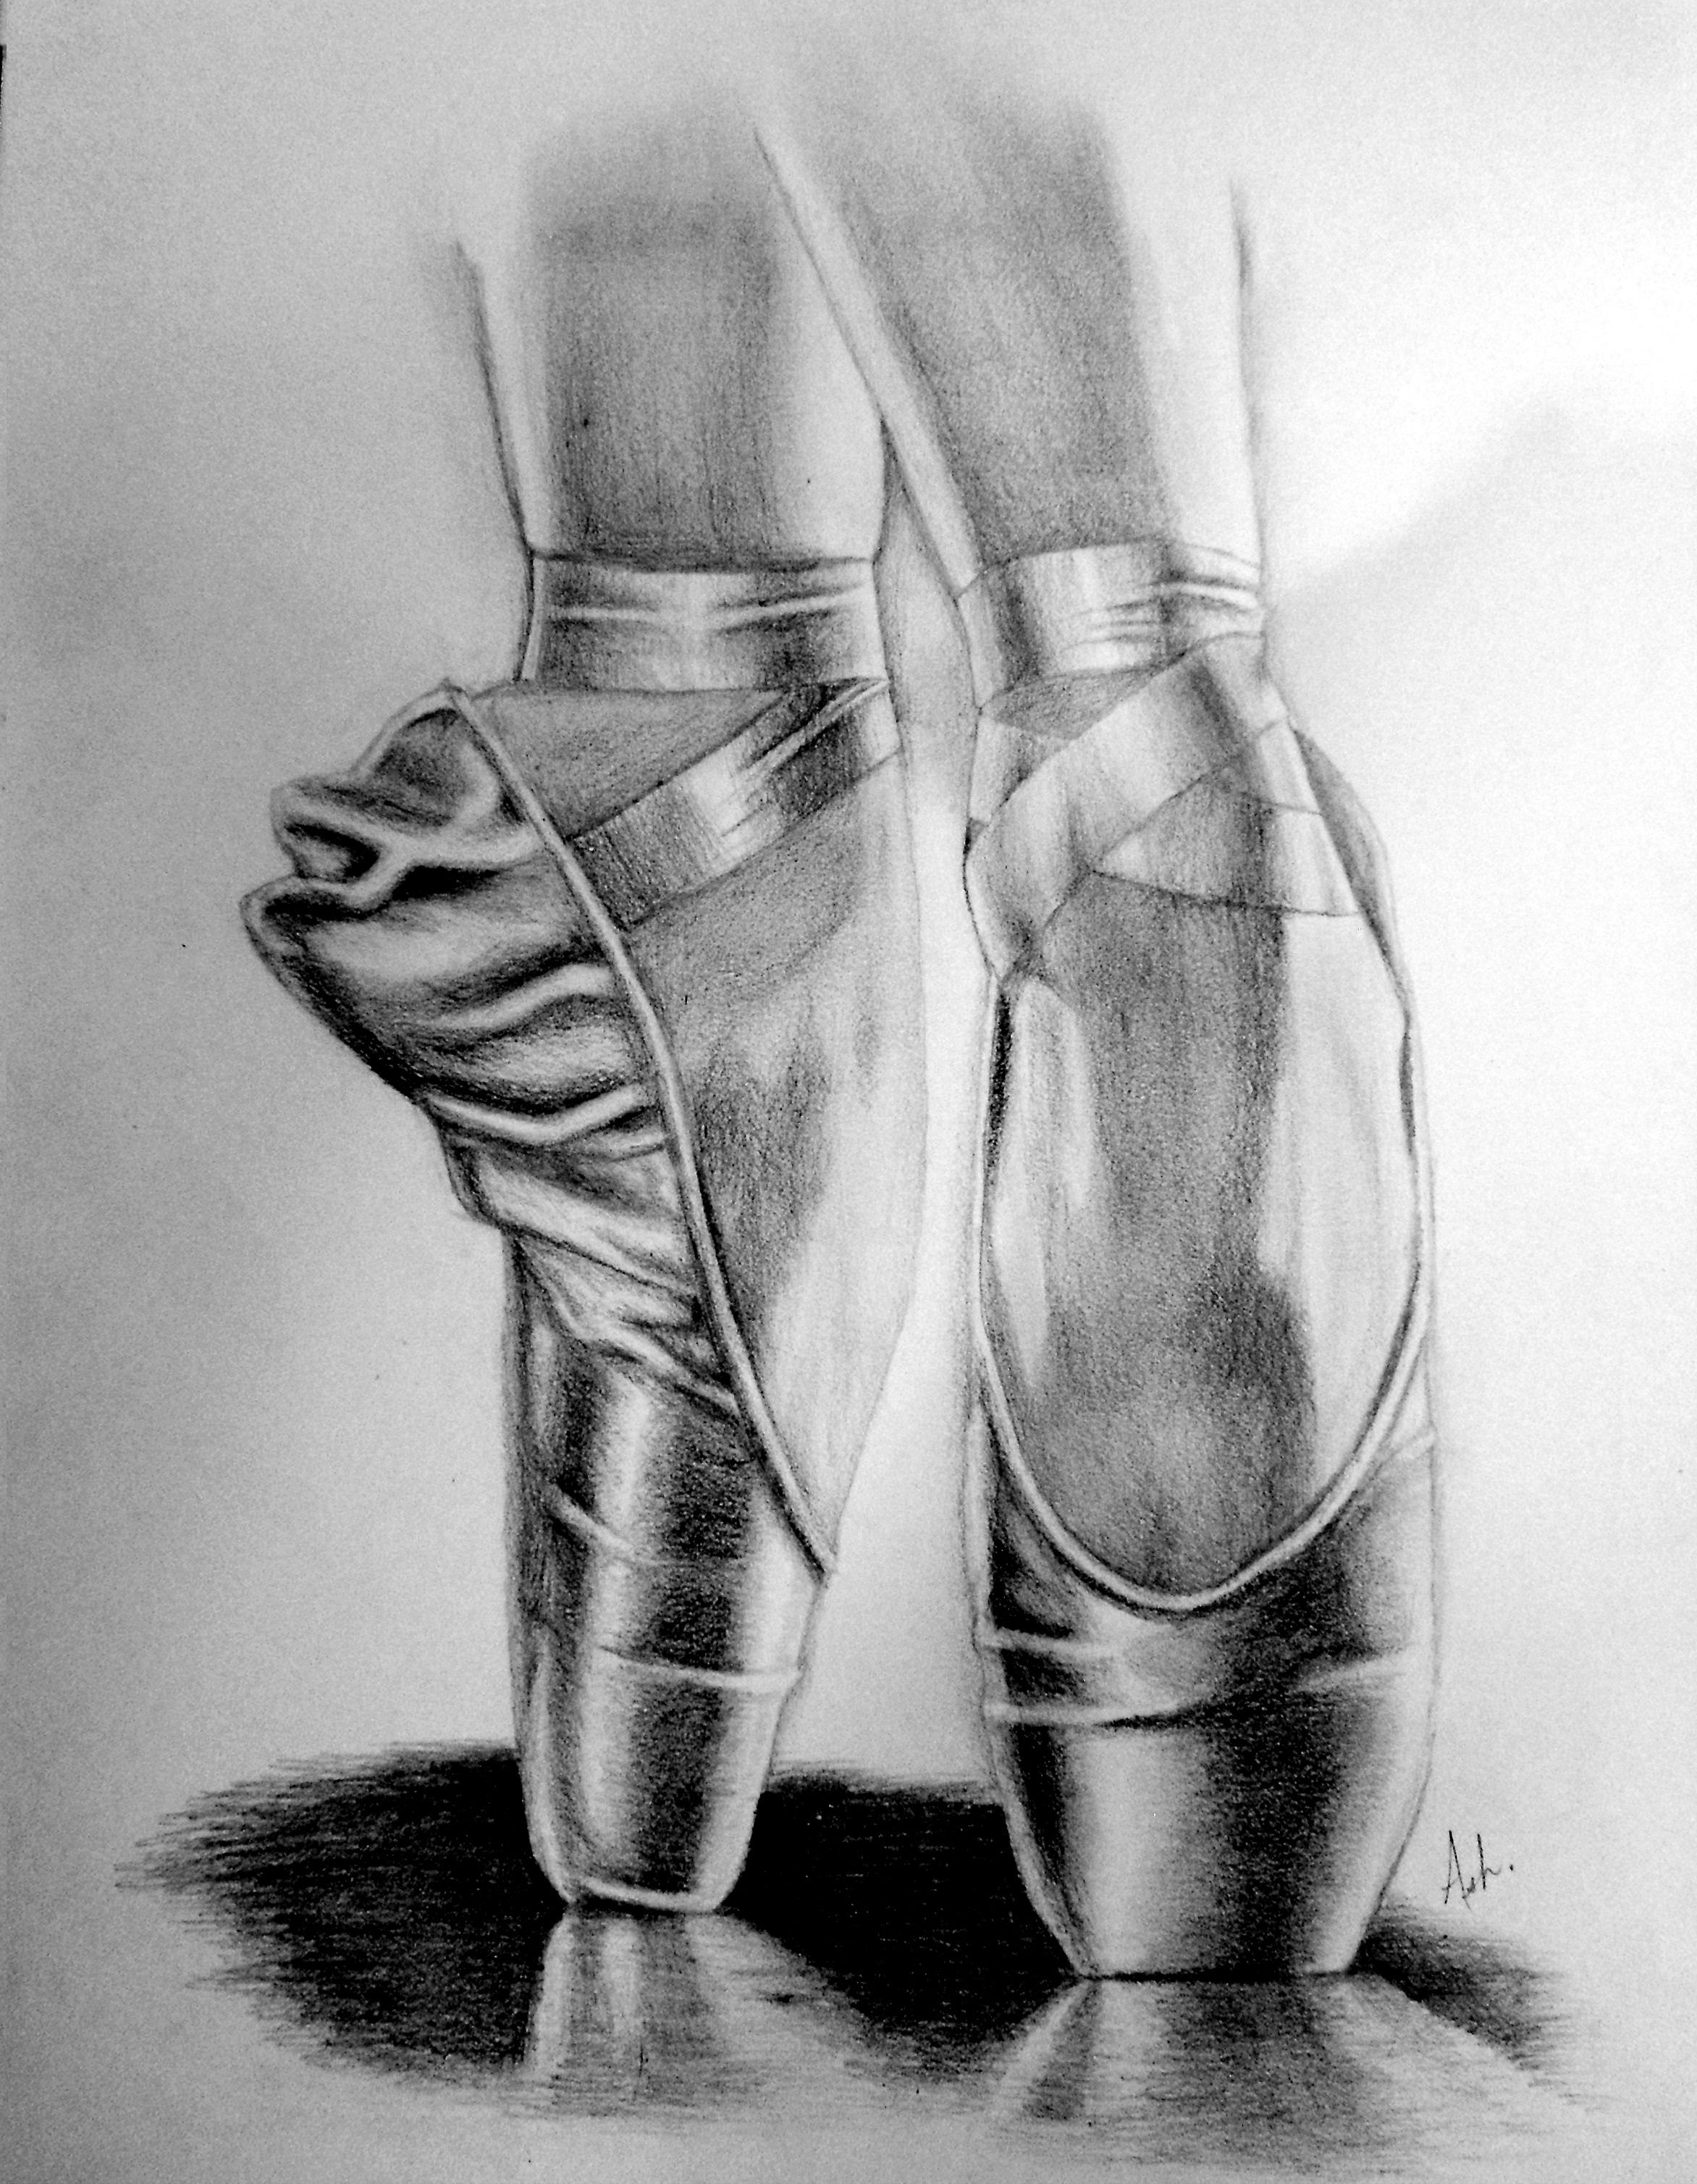 Zeichnungen … | Zeichnungen, Sport zeichnungen, Ballett